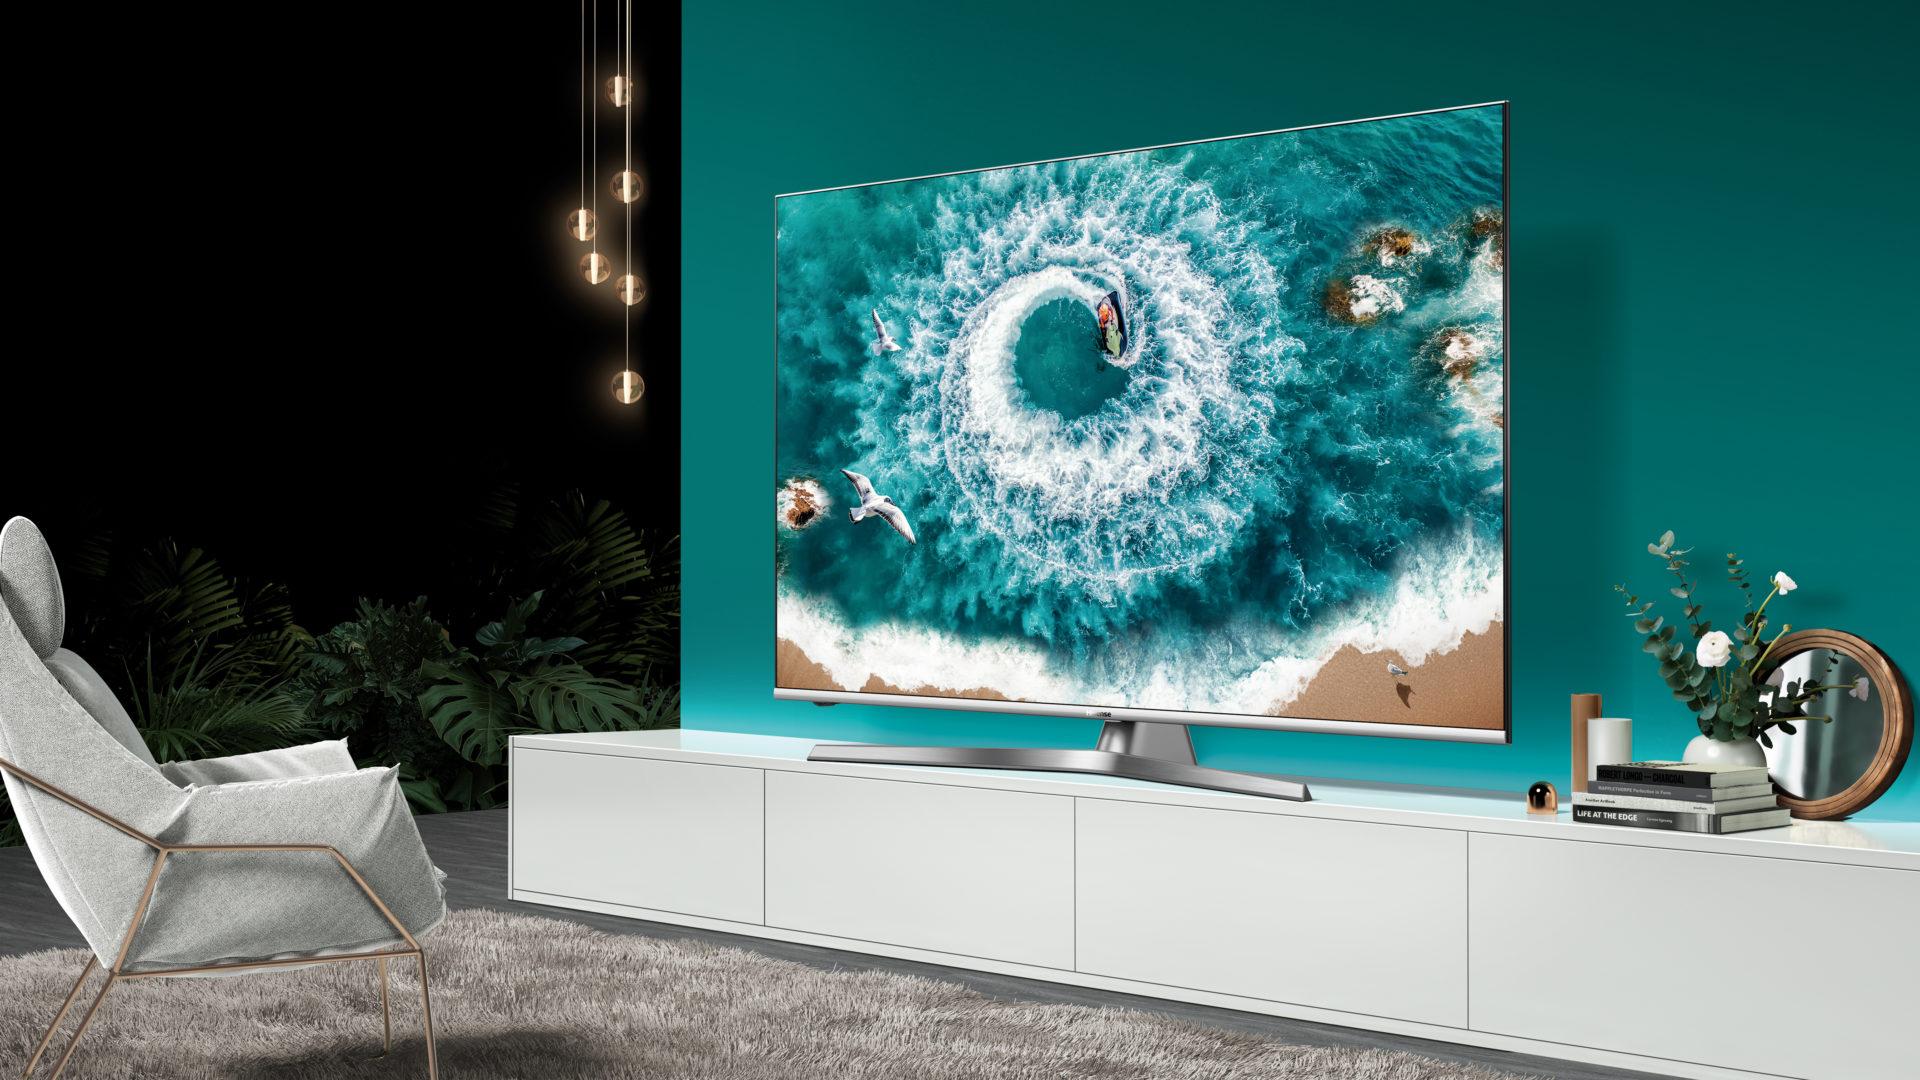 TV Uled